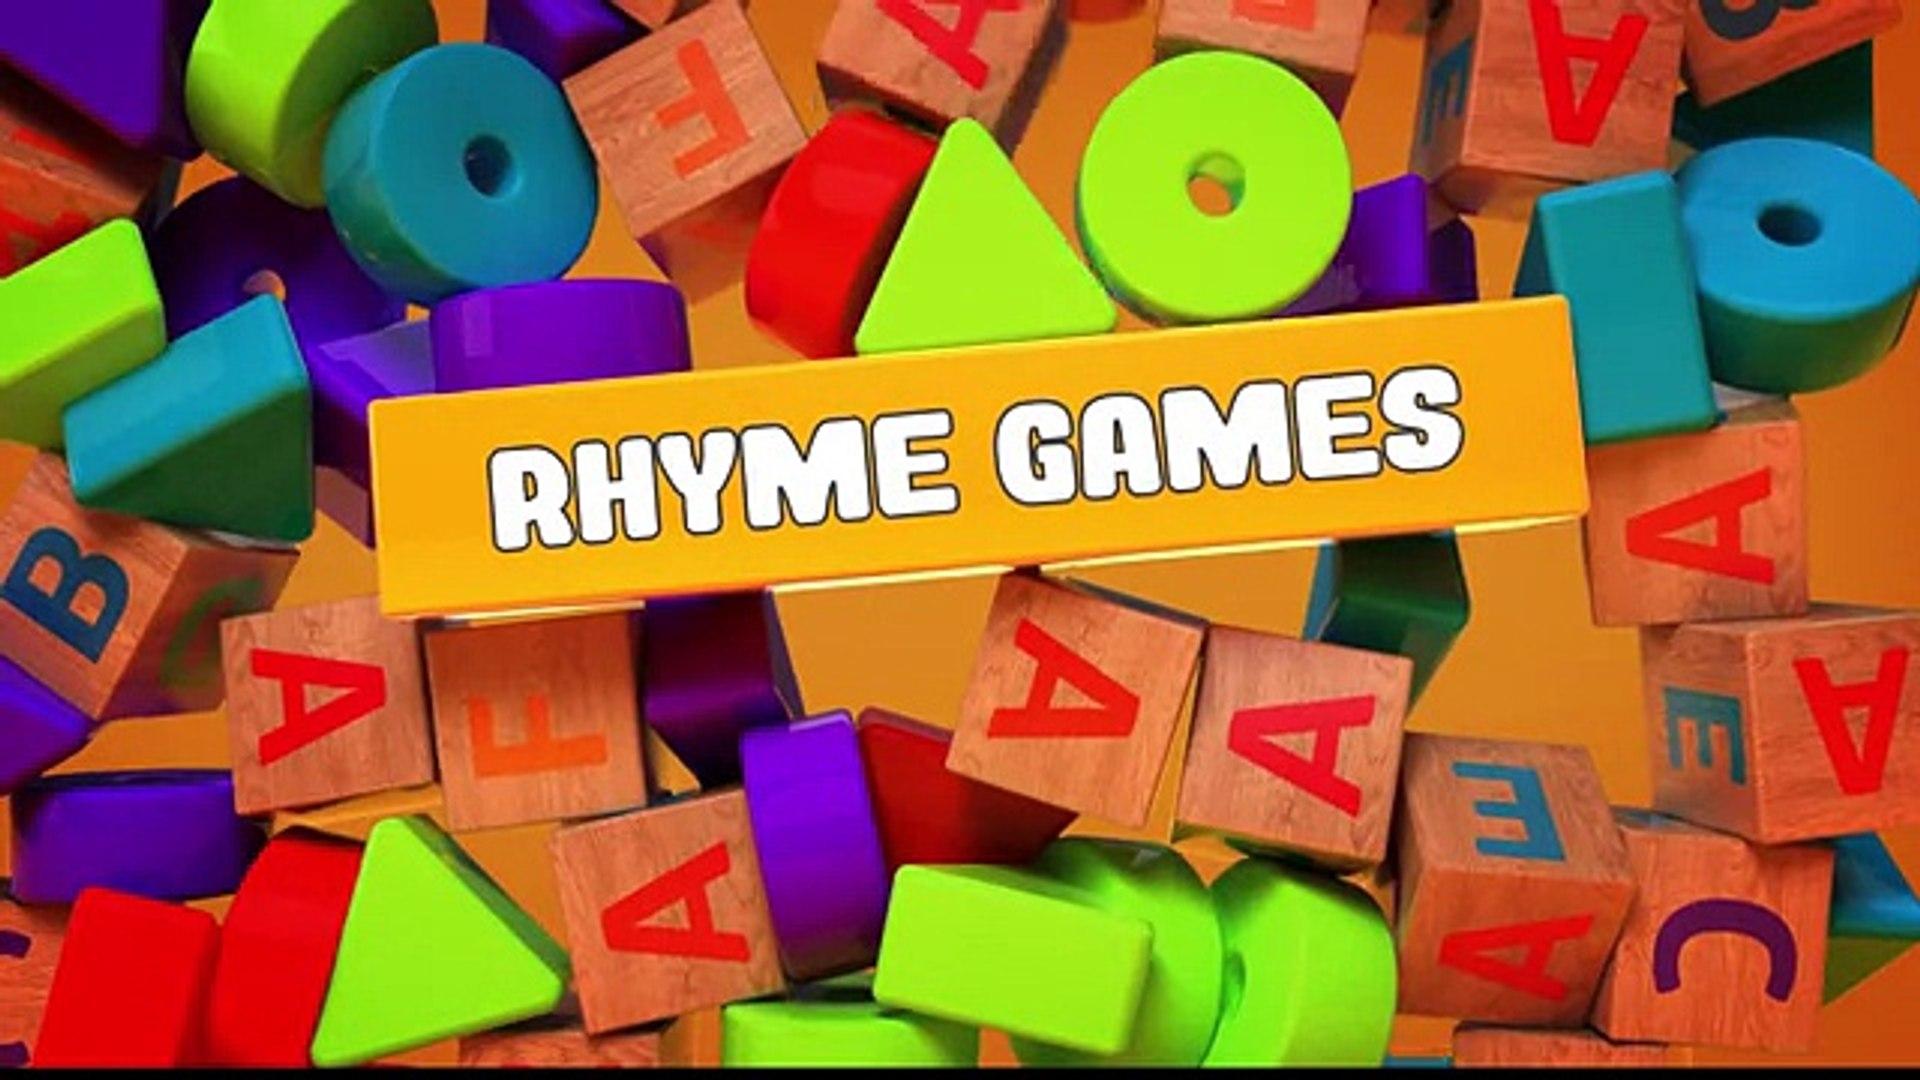 Disney Brave Jigsaw Puzzles  Brave Merida Archery Scotland Games for Children with Nursery Rhymes